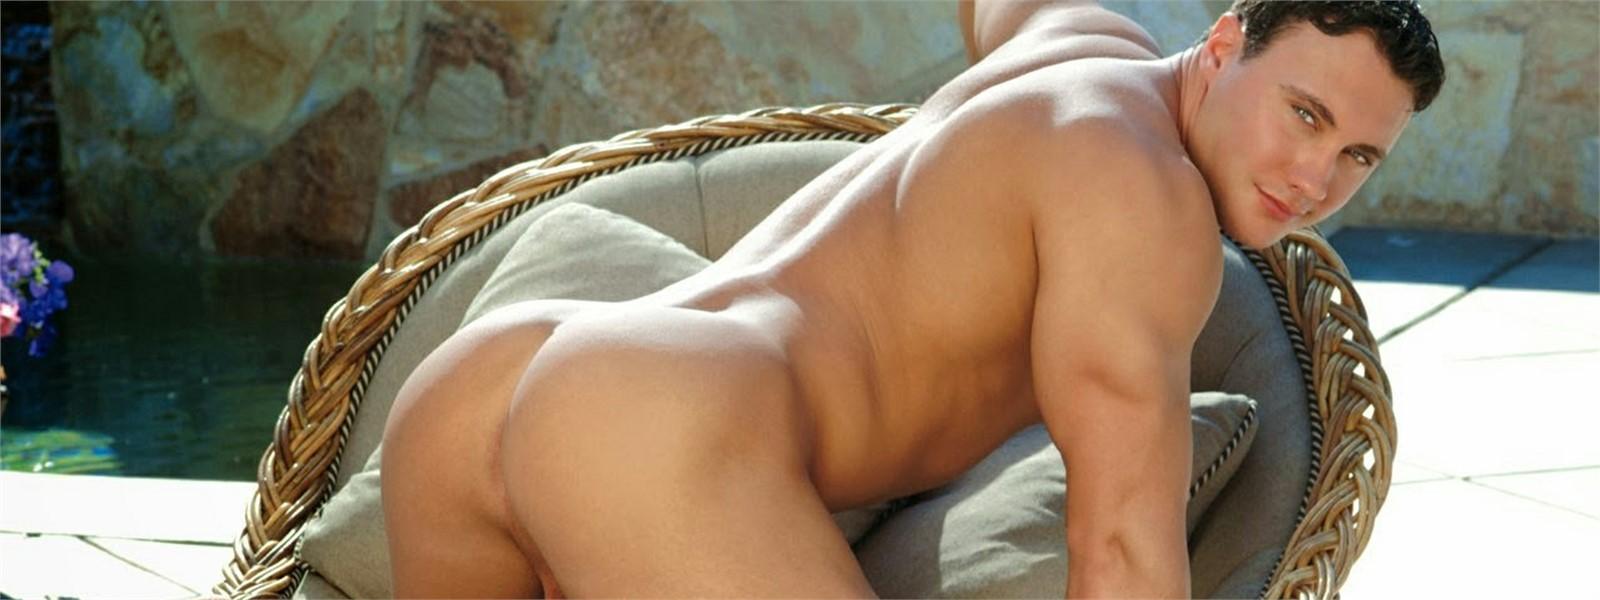 Jason Adonis Gay Porn Star